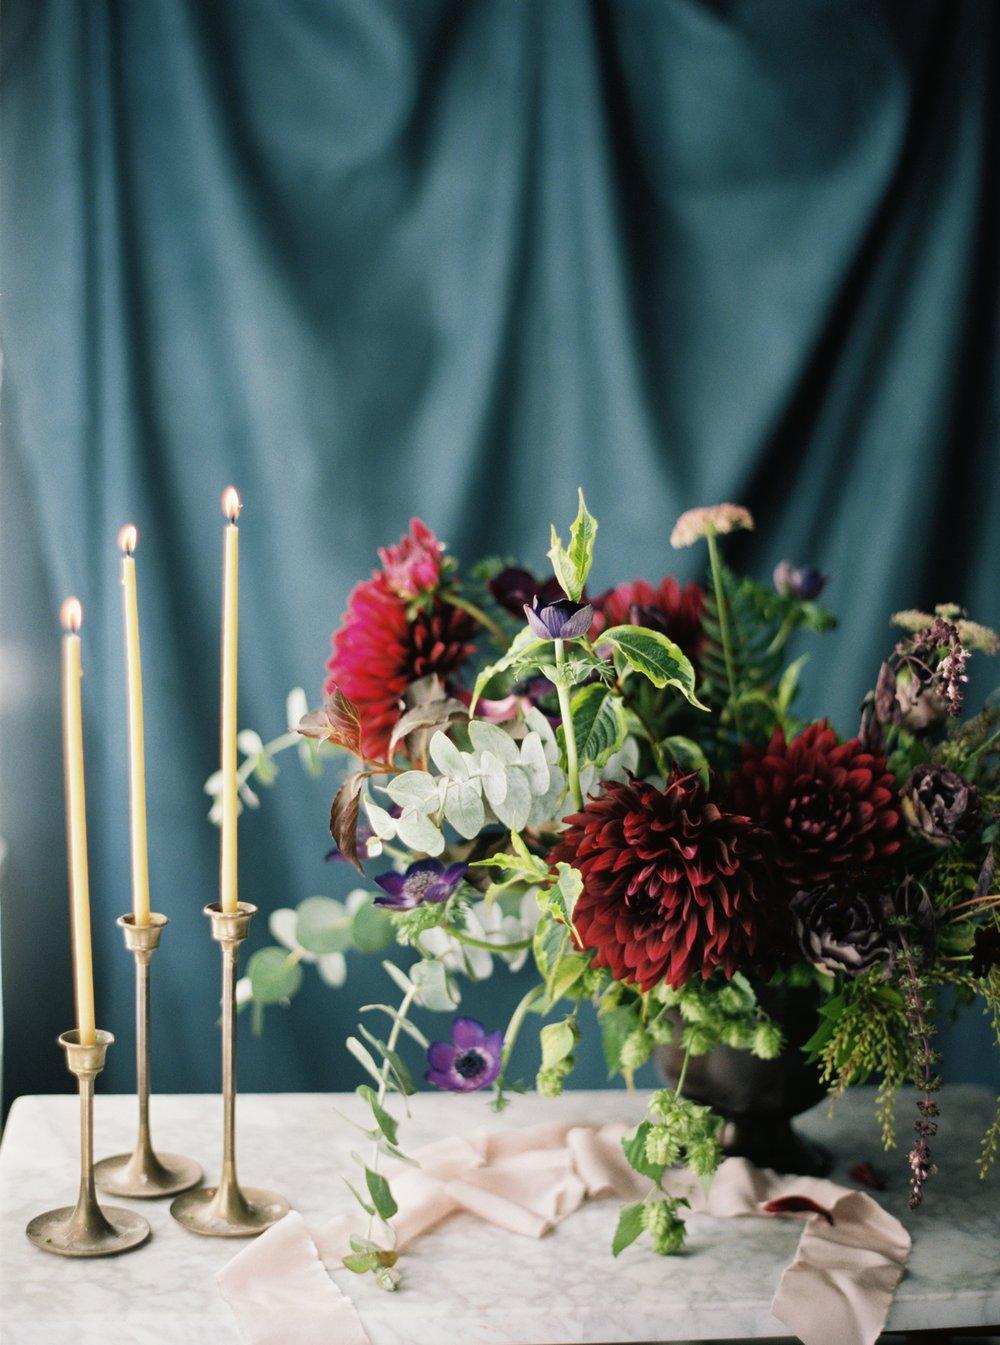 summer centerpiece with purple anemones and burgundy dahlias.jpg